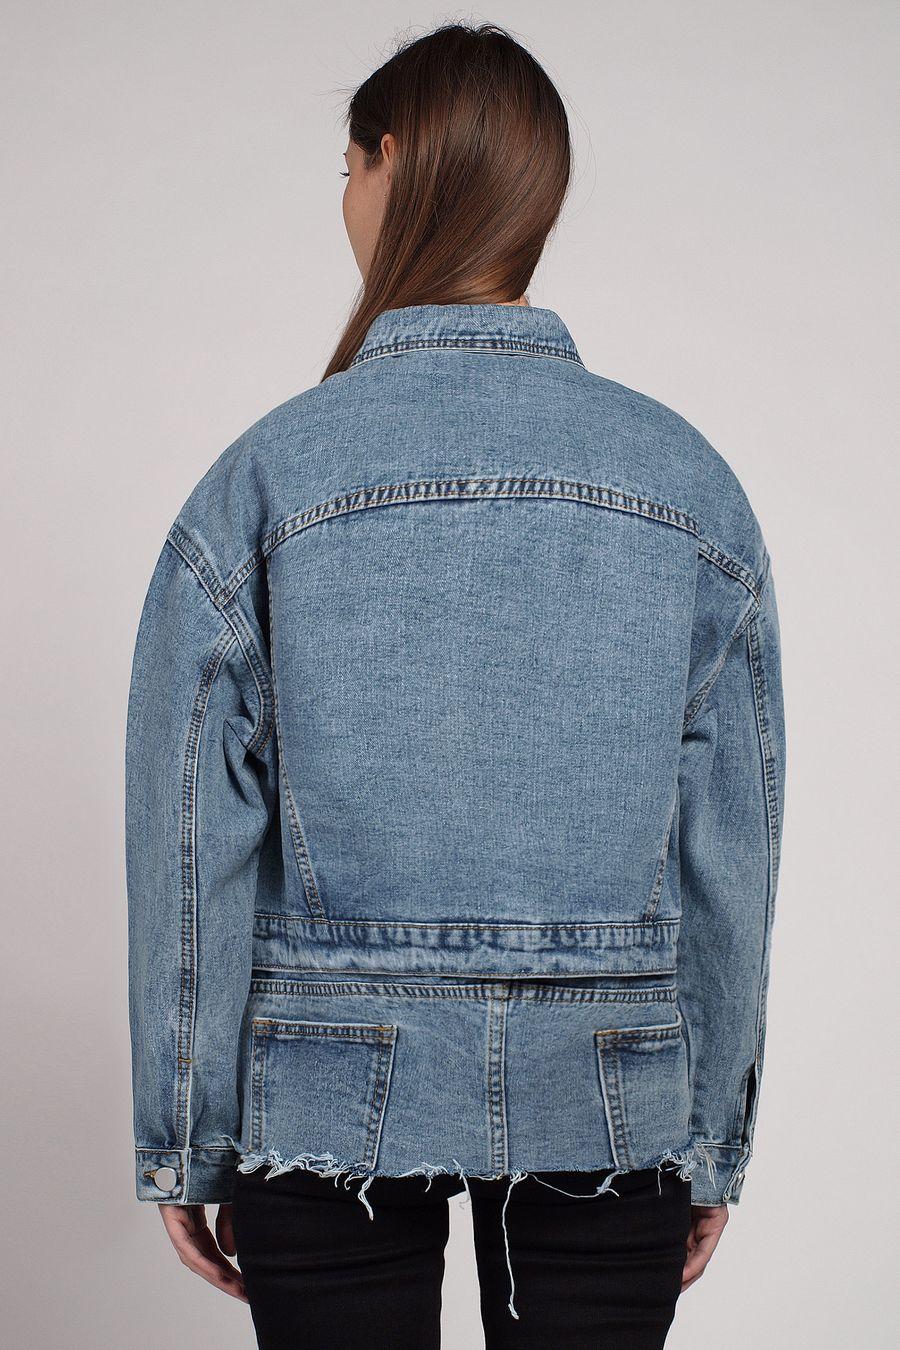 Жакет женский (джинсовка) LRZBS 2026 - фото 3